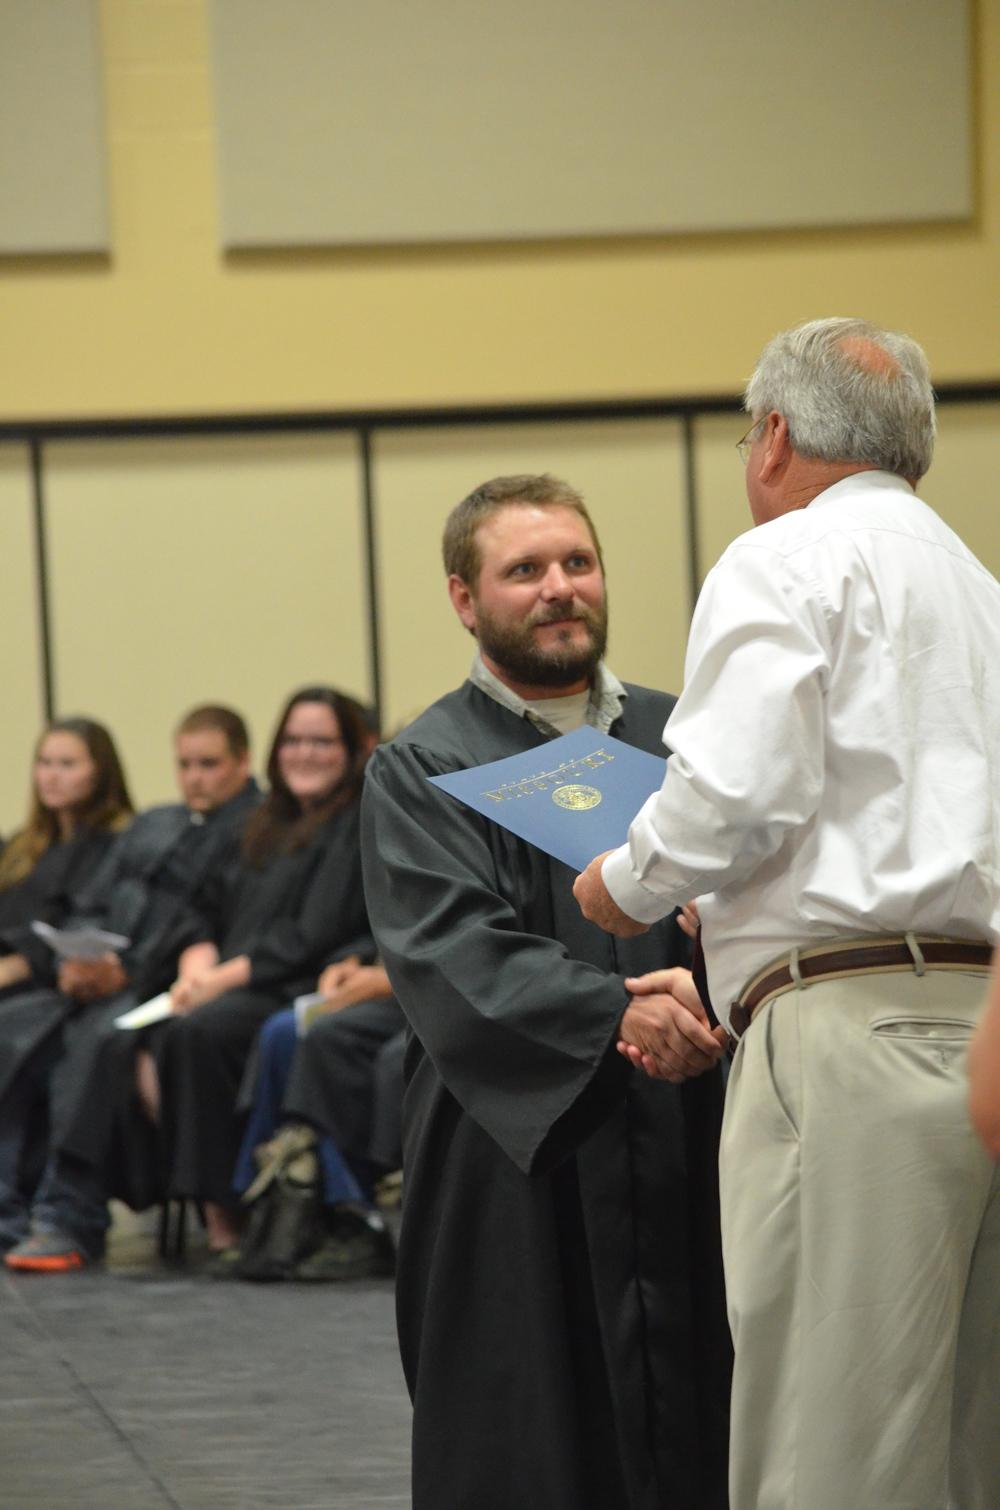 GED Graduation 2012 201.JPG